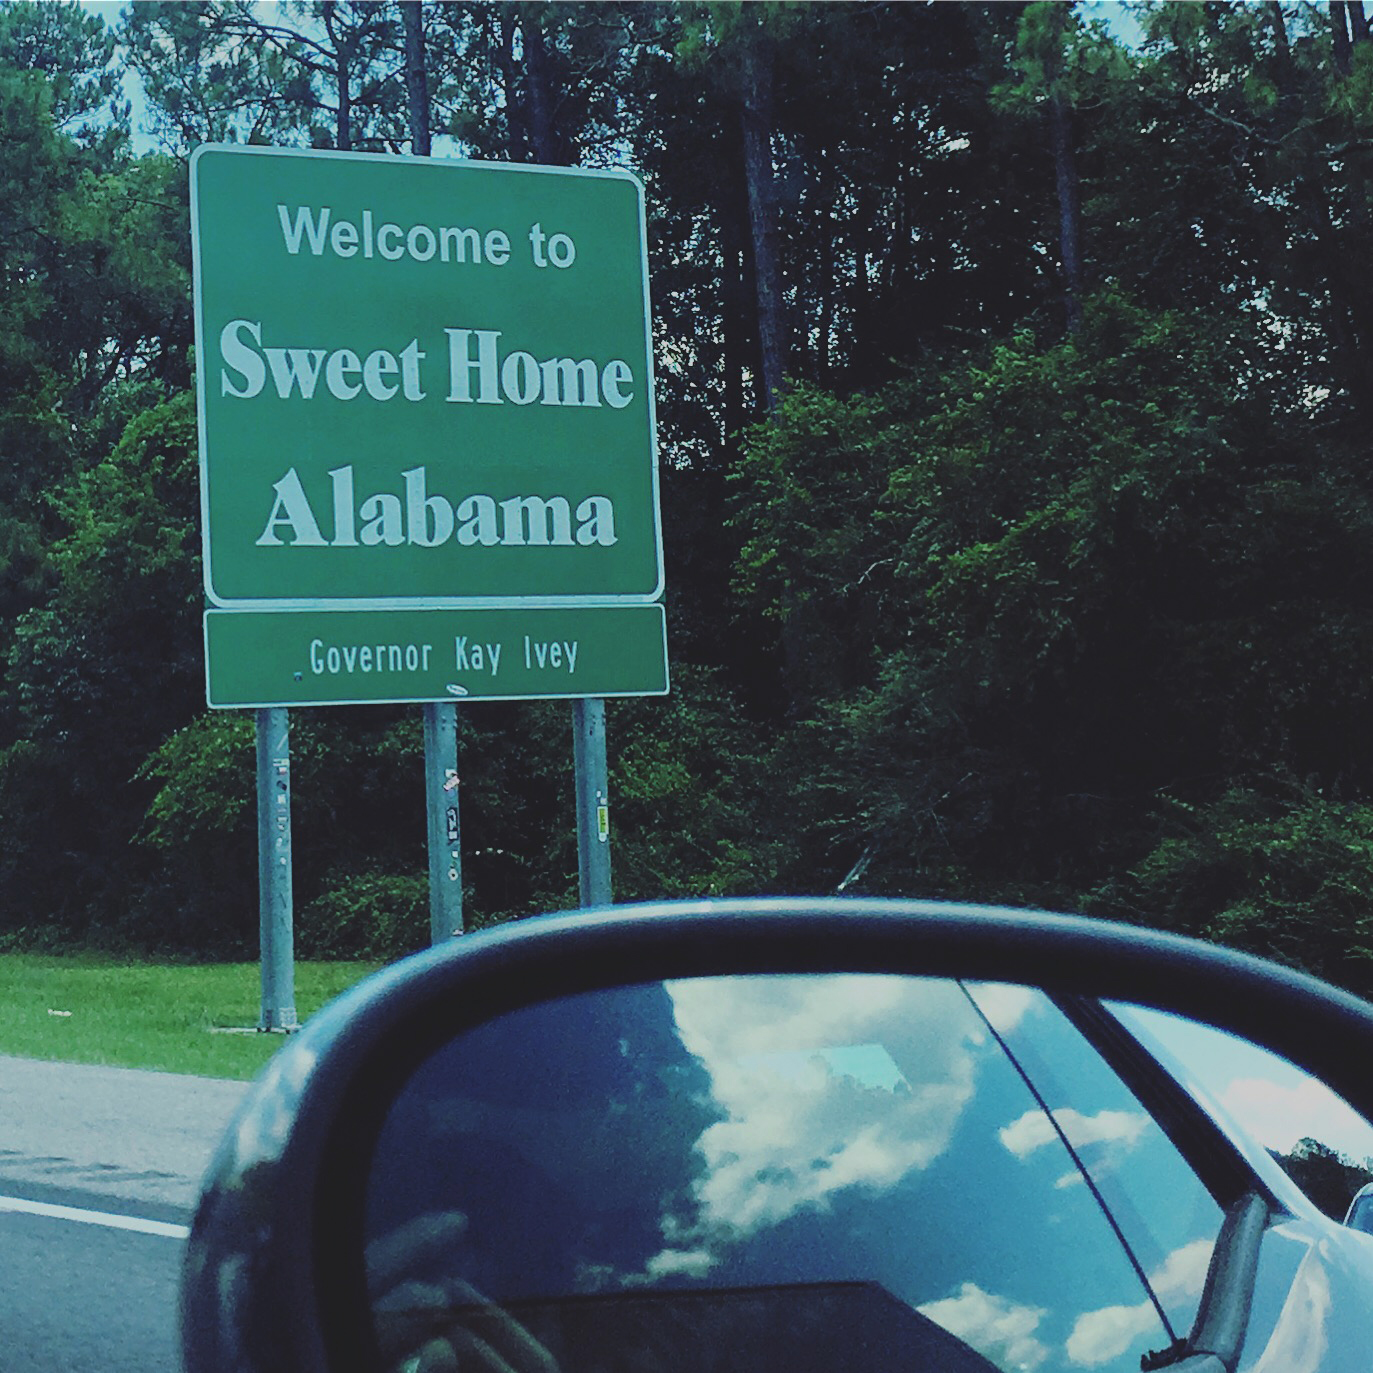 AlabamaRoadSignJune2019BLOG